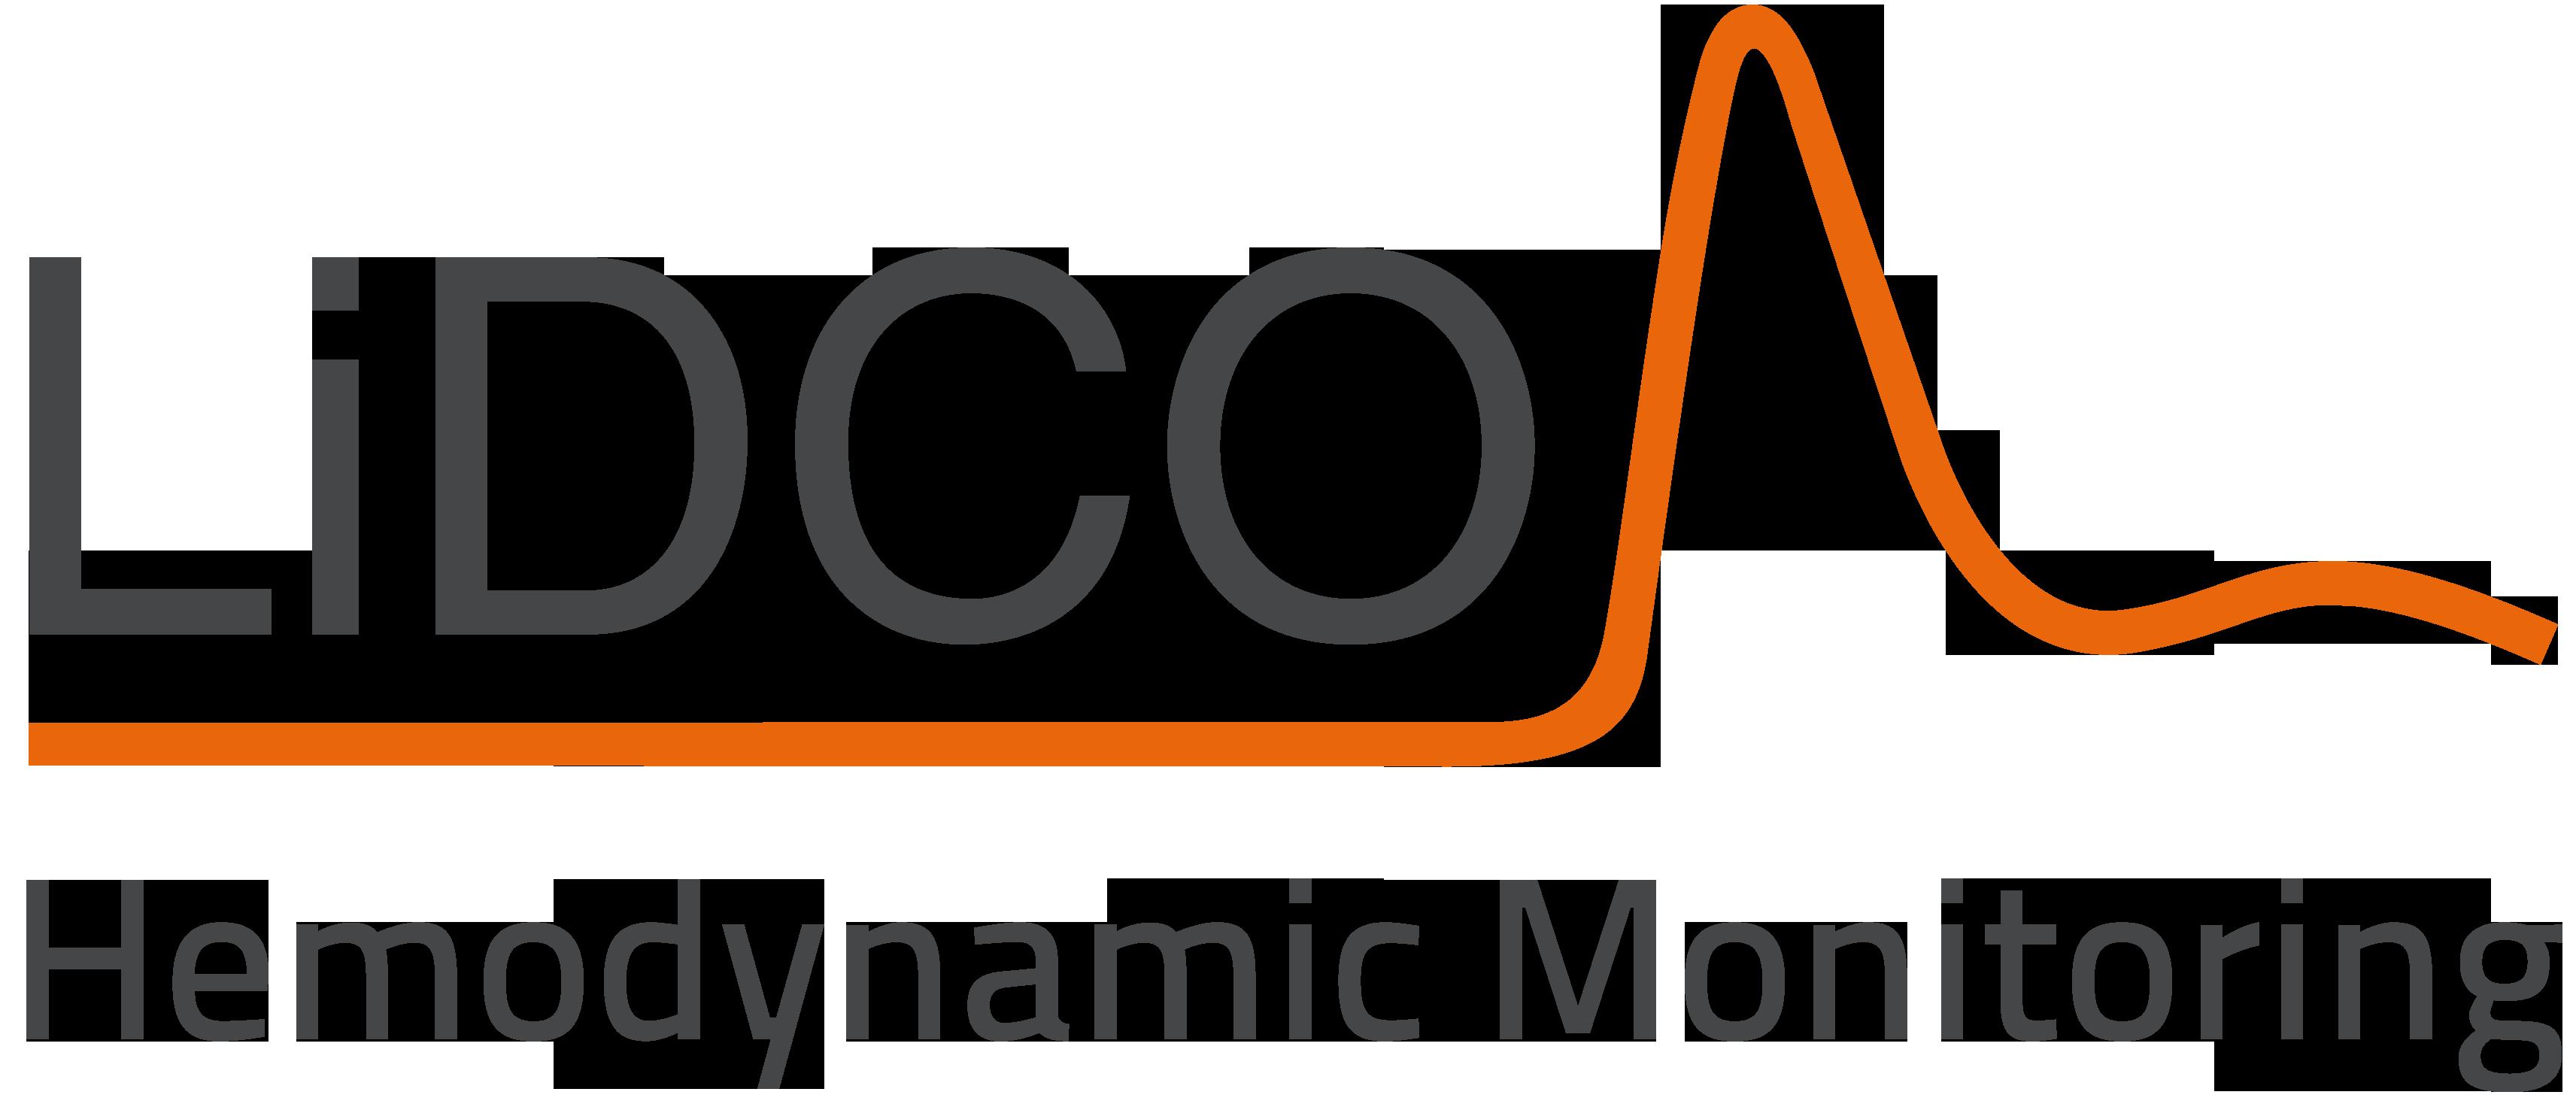 LiDCO Group Plc (LID.L) logo